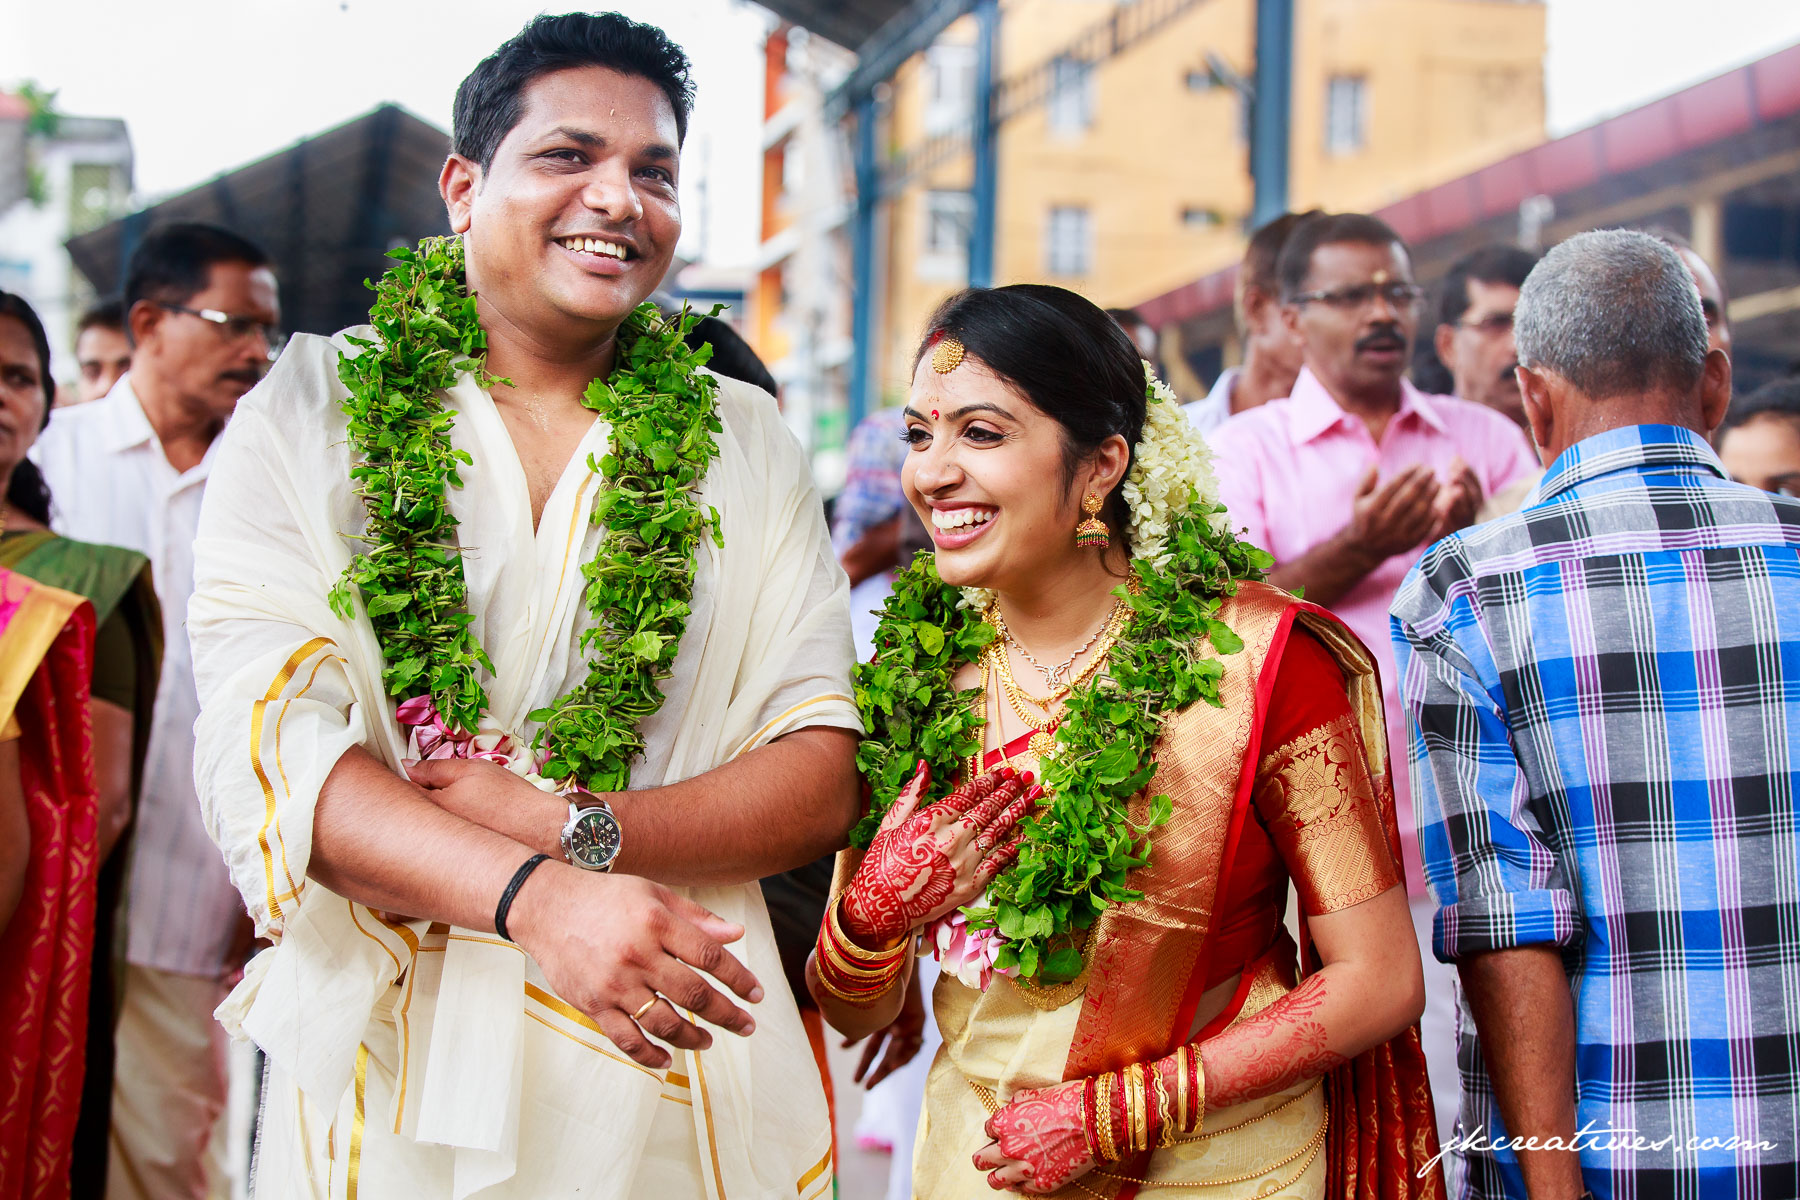 Arun & Manju - Kerala Hindu Wedding at Guruvayoor Temple - Candid Wedding Photography by Best Candid Photographers in Kerala_Coimbatore, Chennai, Bangalore, Tamil Nadu, Hyderabad,Kerala